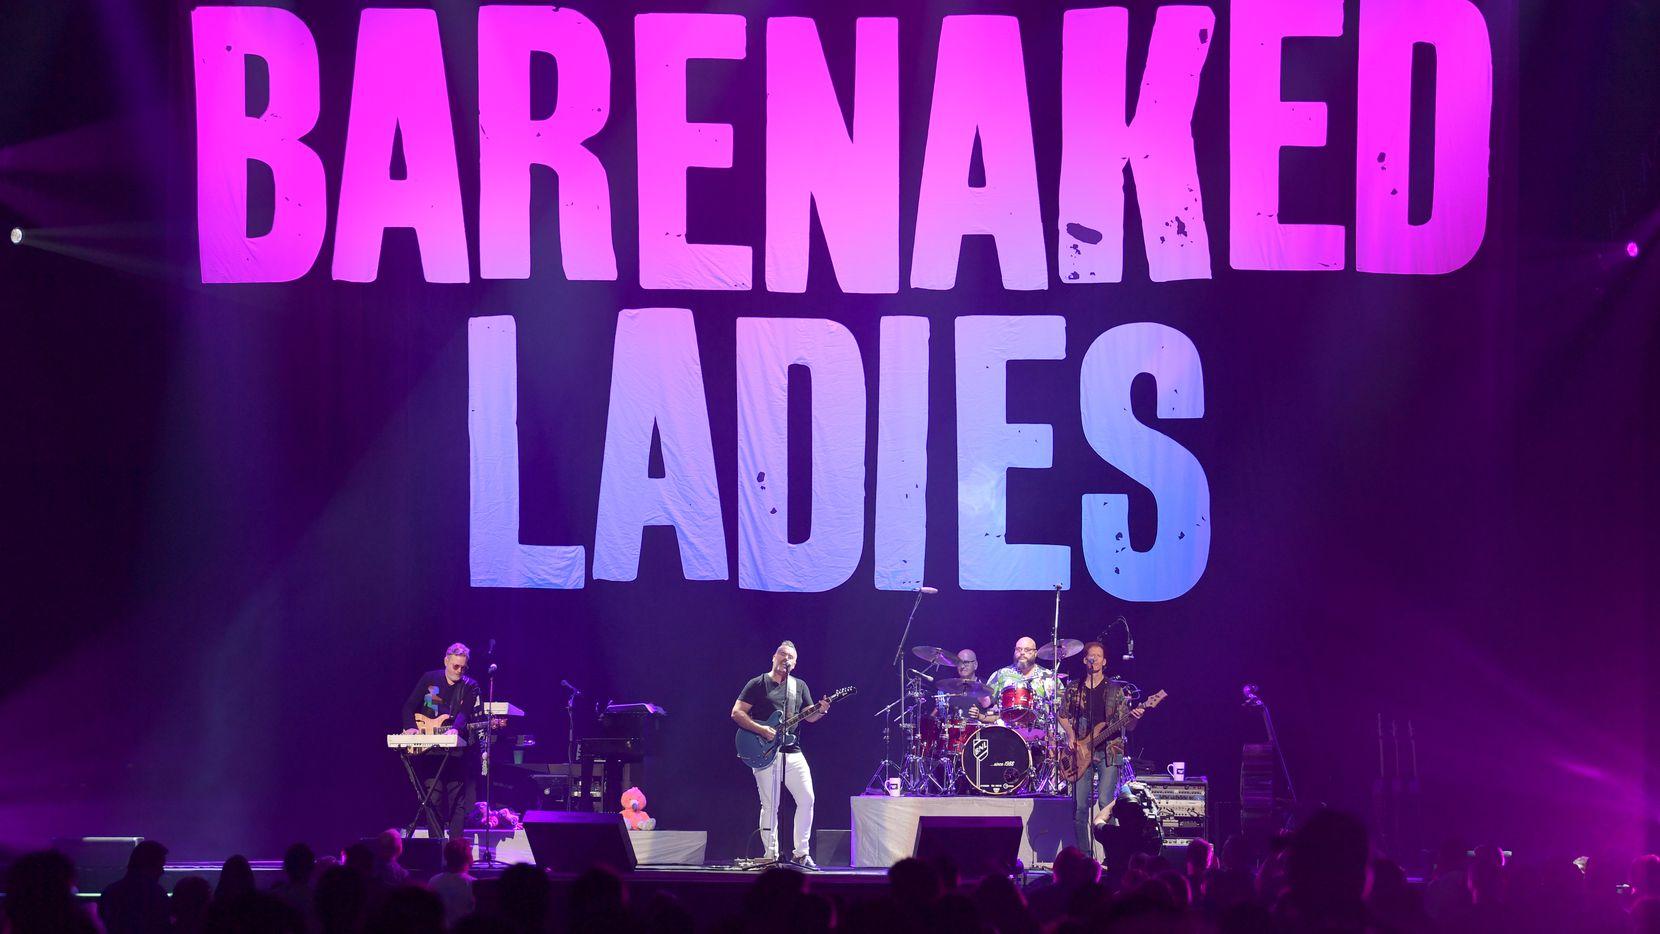 Kevin Hearn, Ed Robertson, Tyler Stewart and Jim Creeggan of the Barenaked Ladies perform at Bridgestone Arena on Sept. 7, 2019, in Nashville.